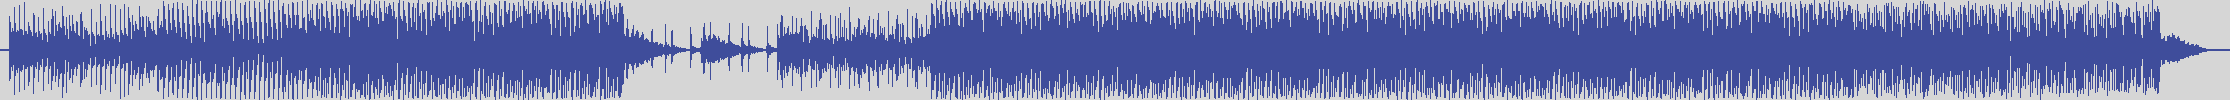 workin [WRK011] Celio Manna - Star Hotel [Plastique Soul's House Mix] audio wave form